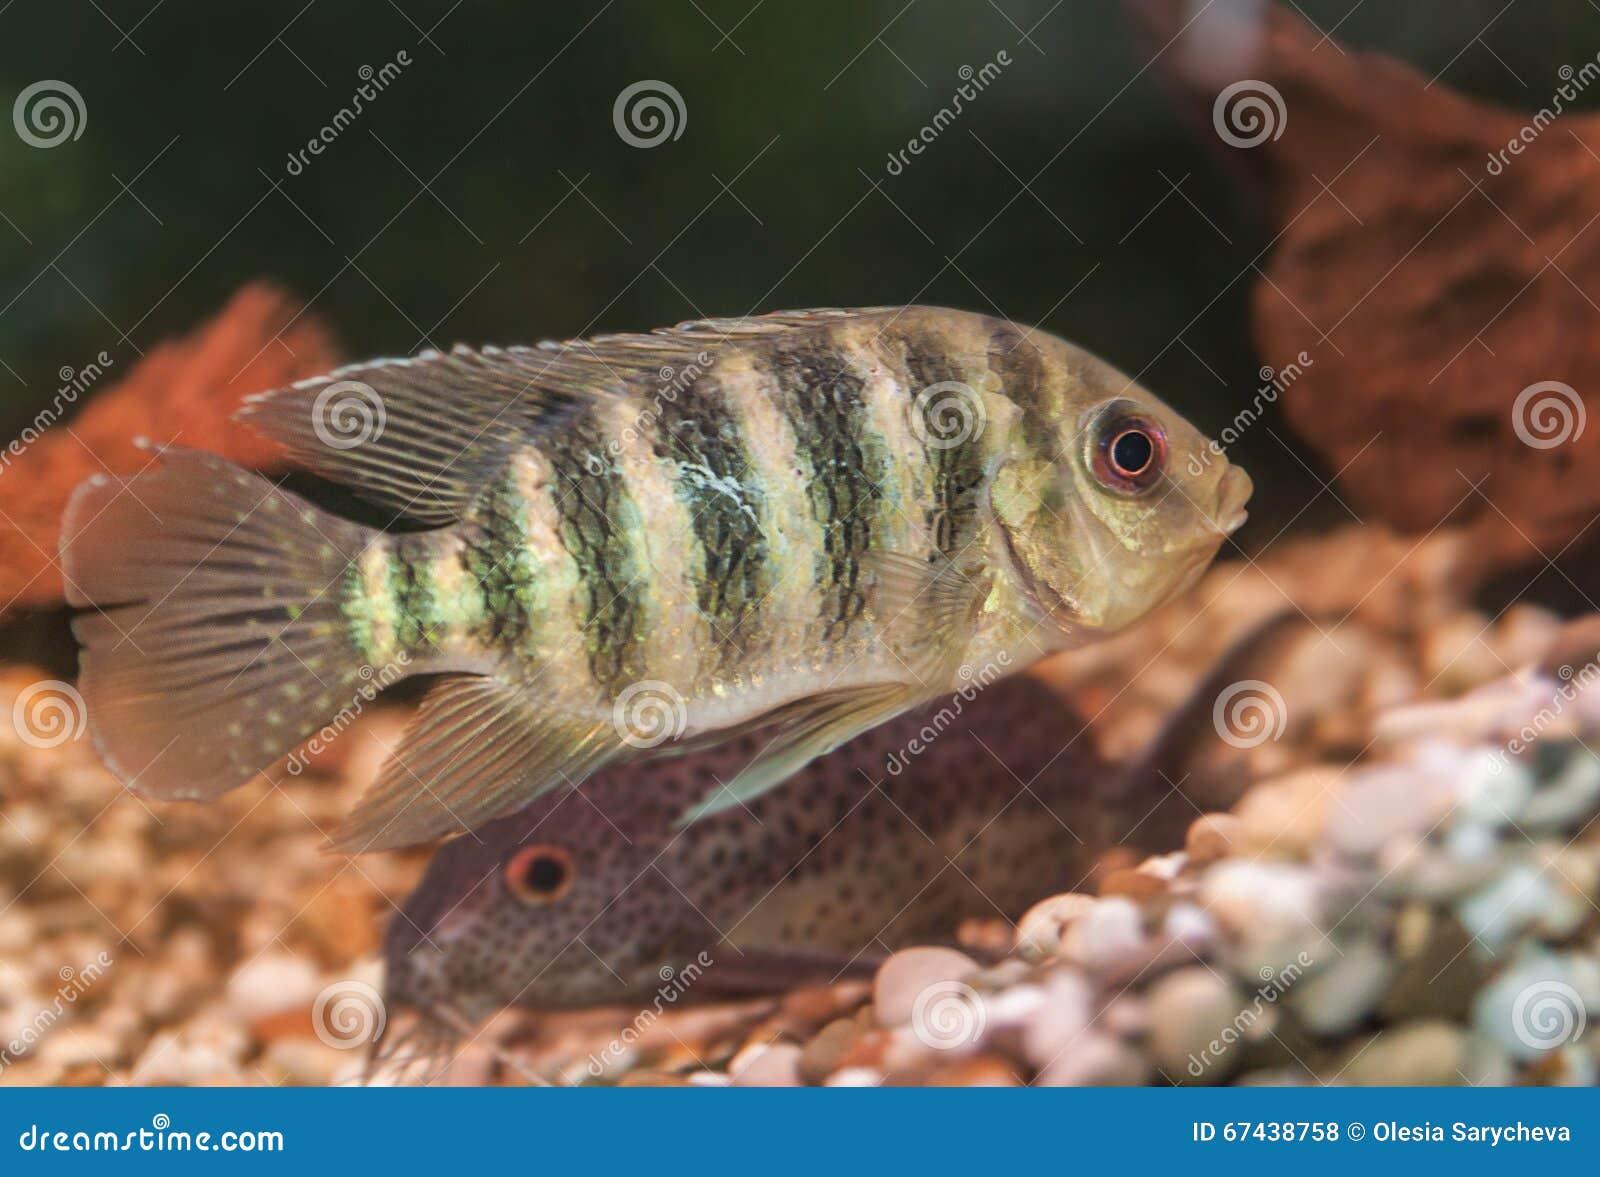 Freshwater aquarium fish by region - Striped Aquarium Fish Cichlid Group